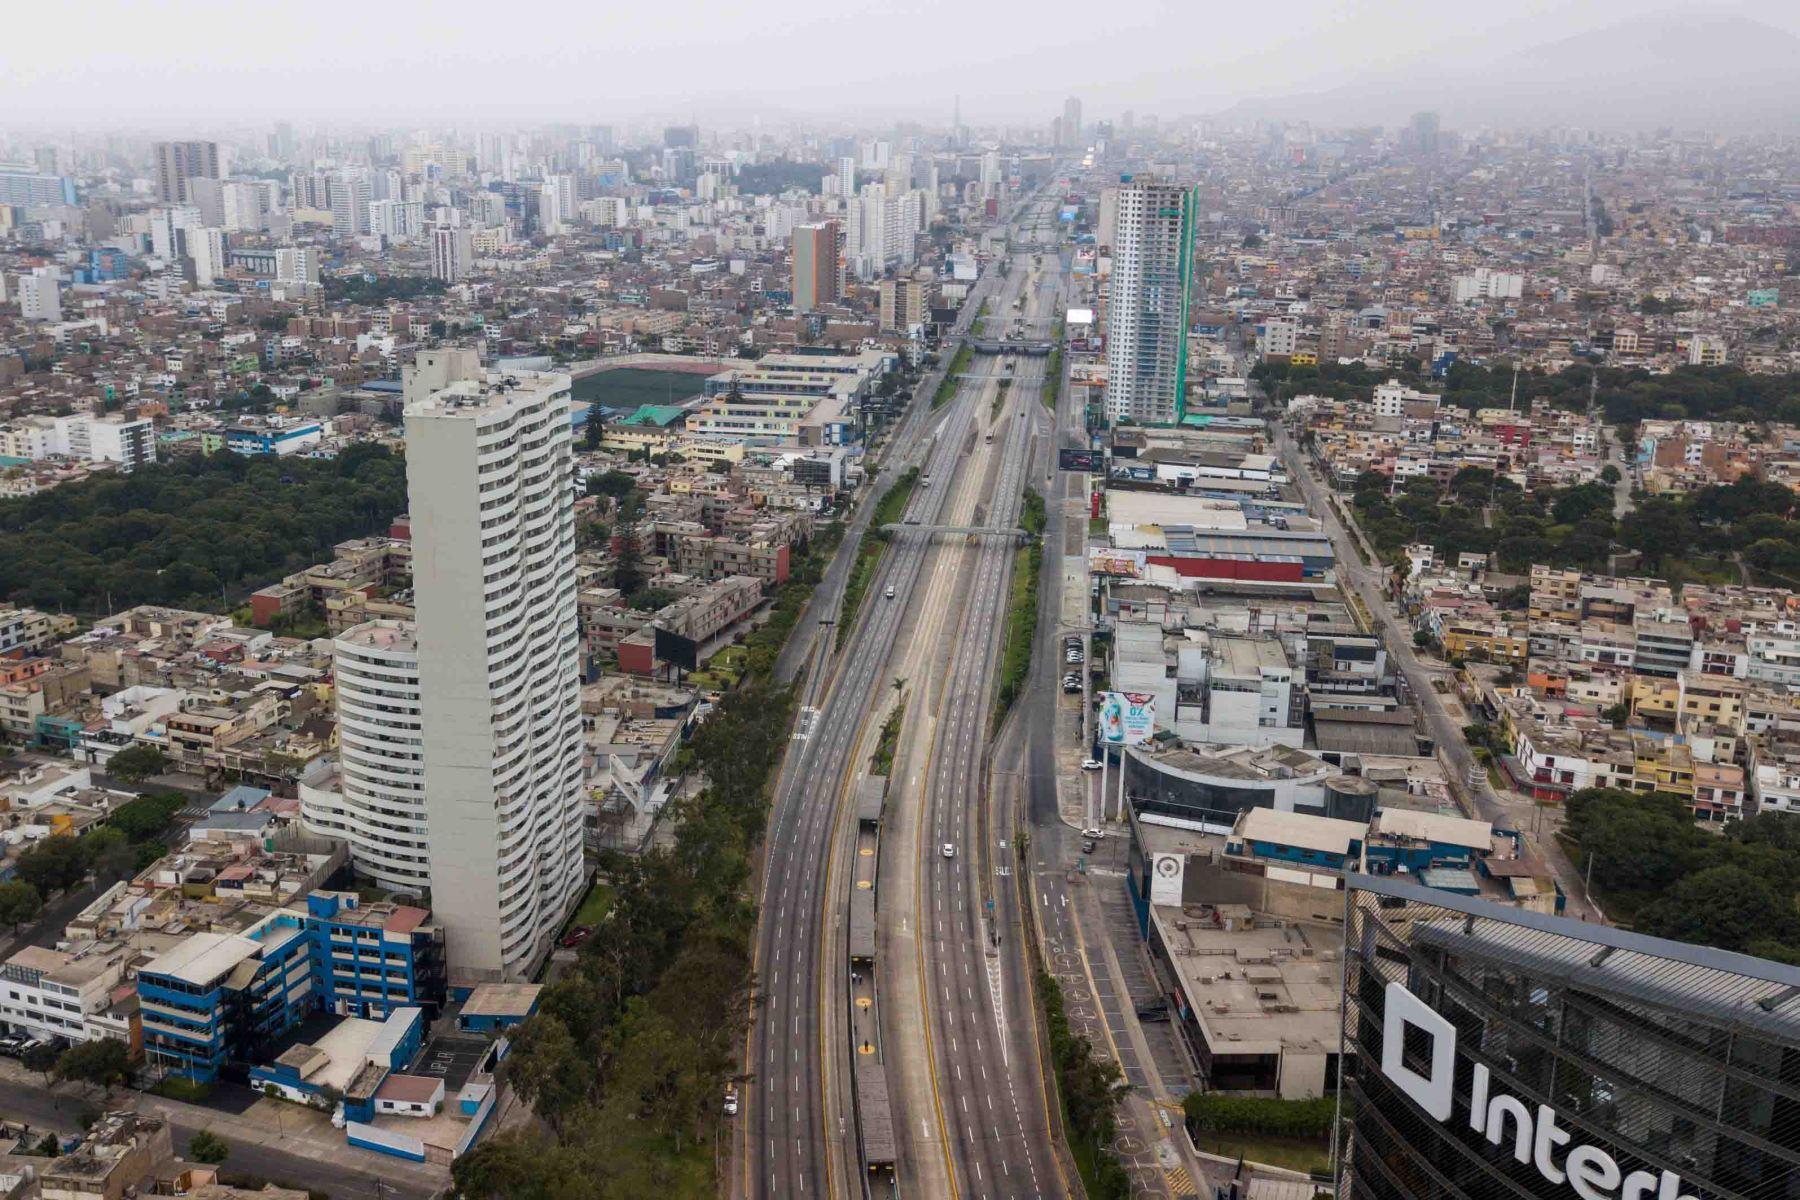 Así lucen algunas zonas de Limas en segundo día de emergencia sanitaria.Foto: ANDINA/Carlos Lezama